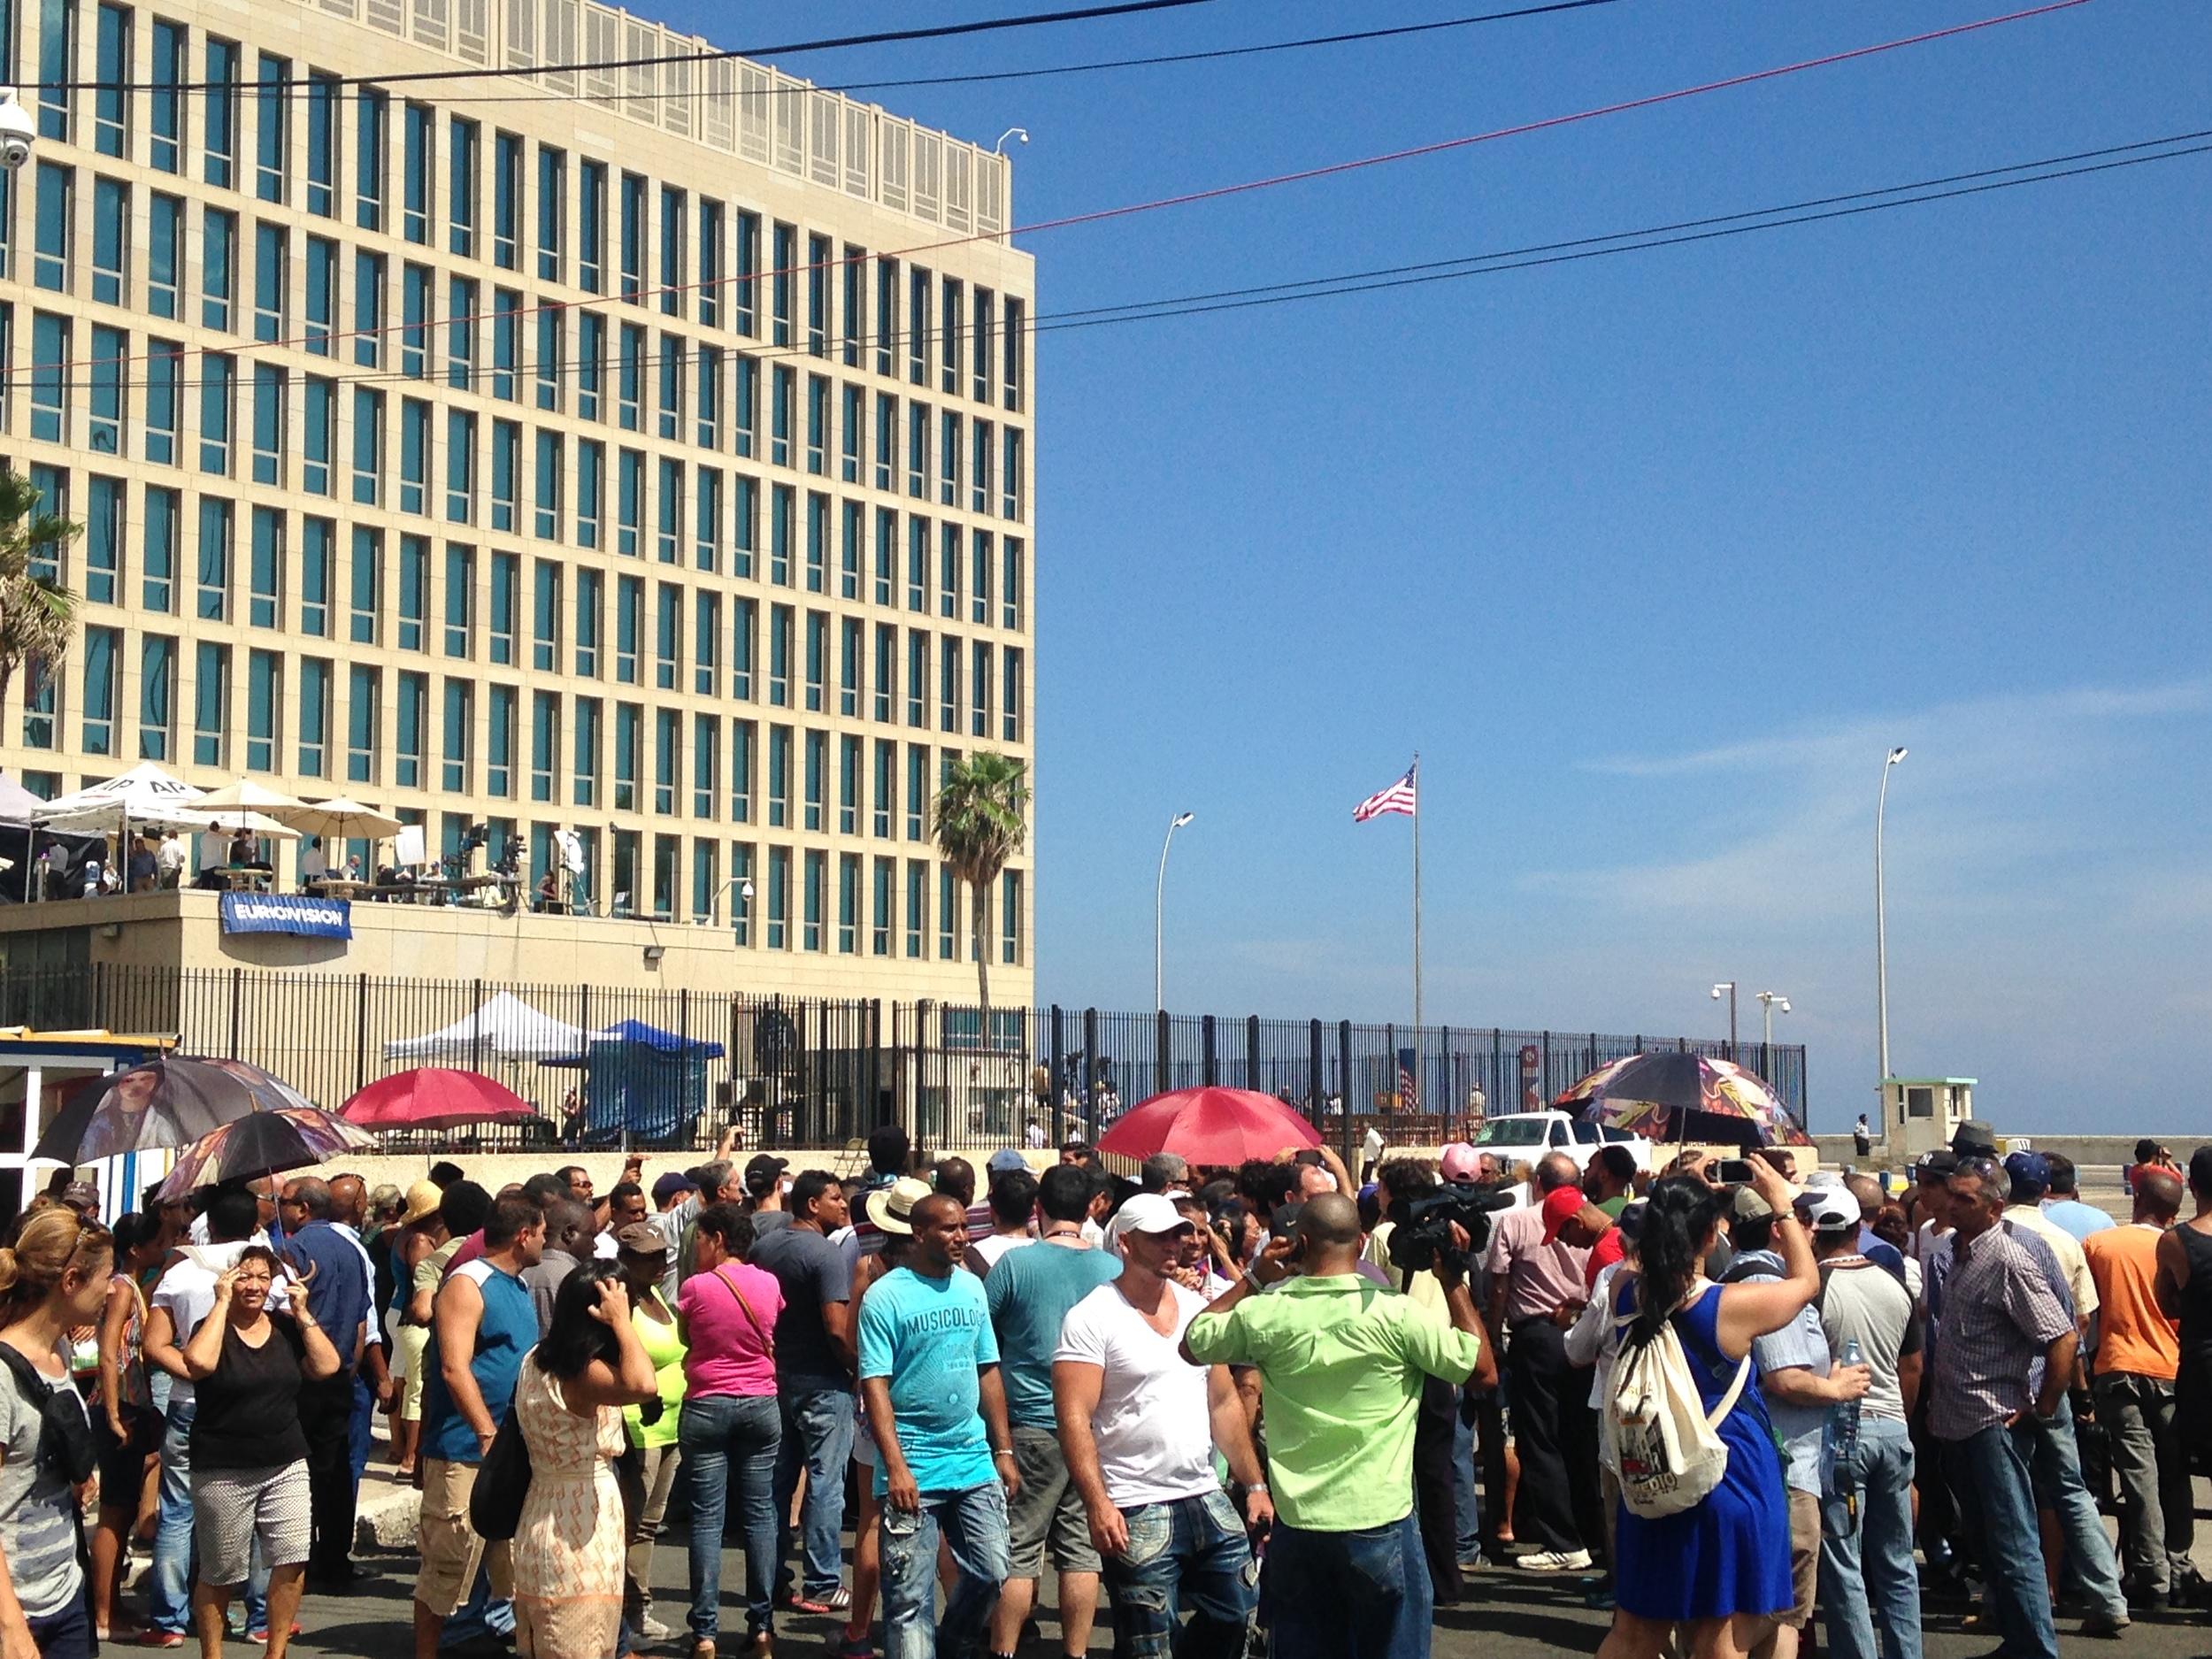 8.14.15 Crowd Outside U.S. Embassy in Havana for Flag Raising Ceremony